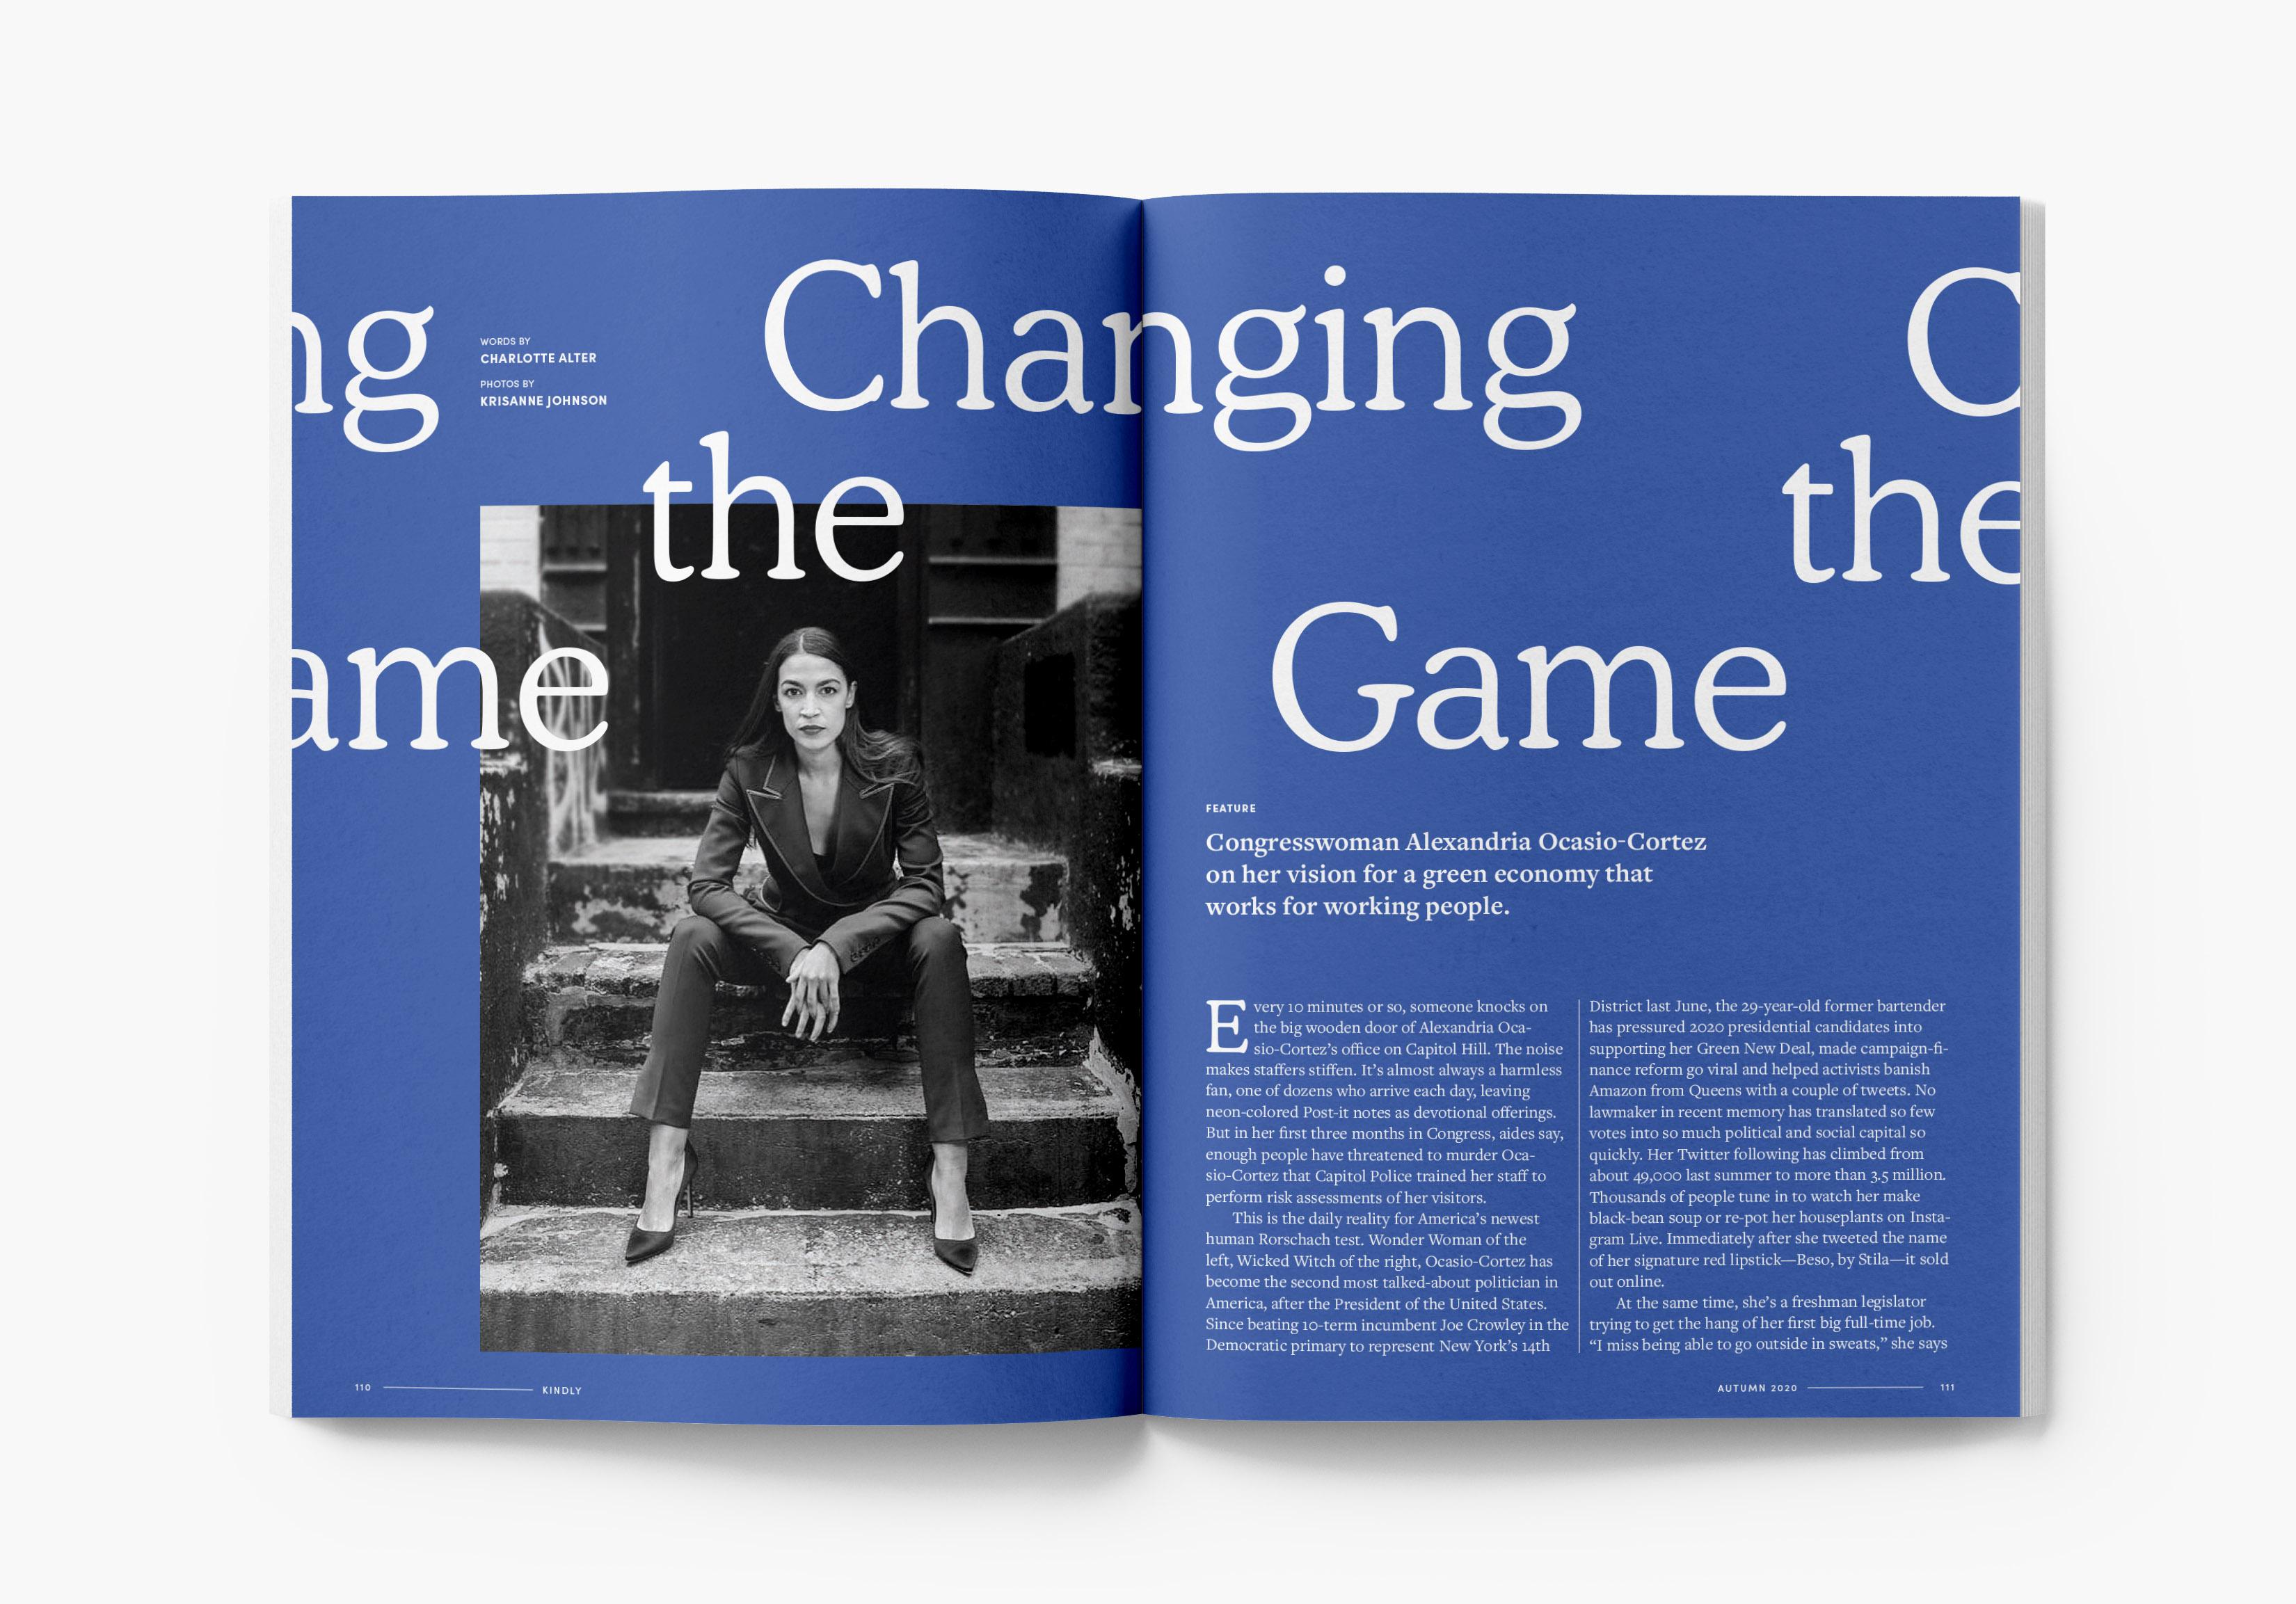 Magazine featured article on Alexandria Ocasio-Cortez